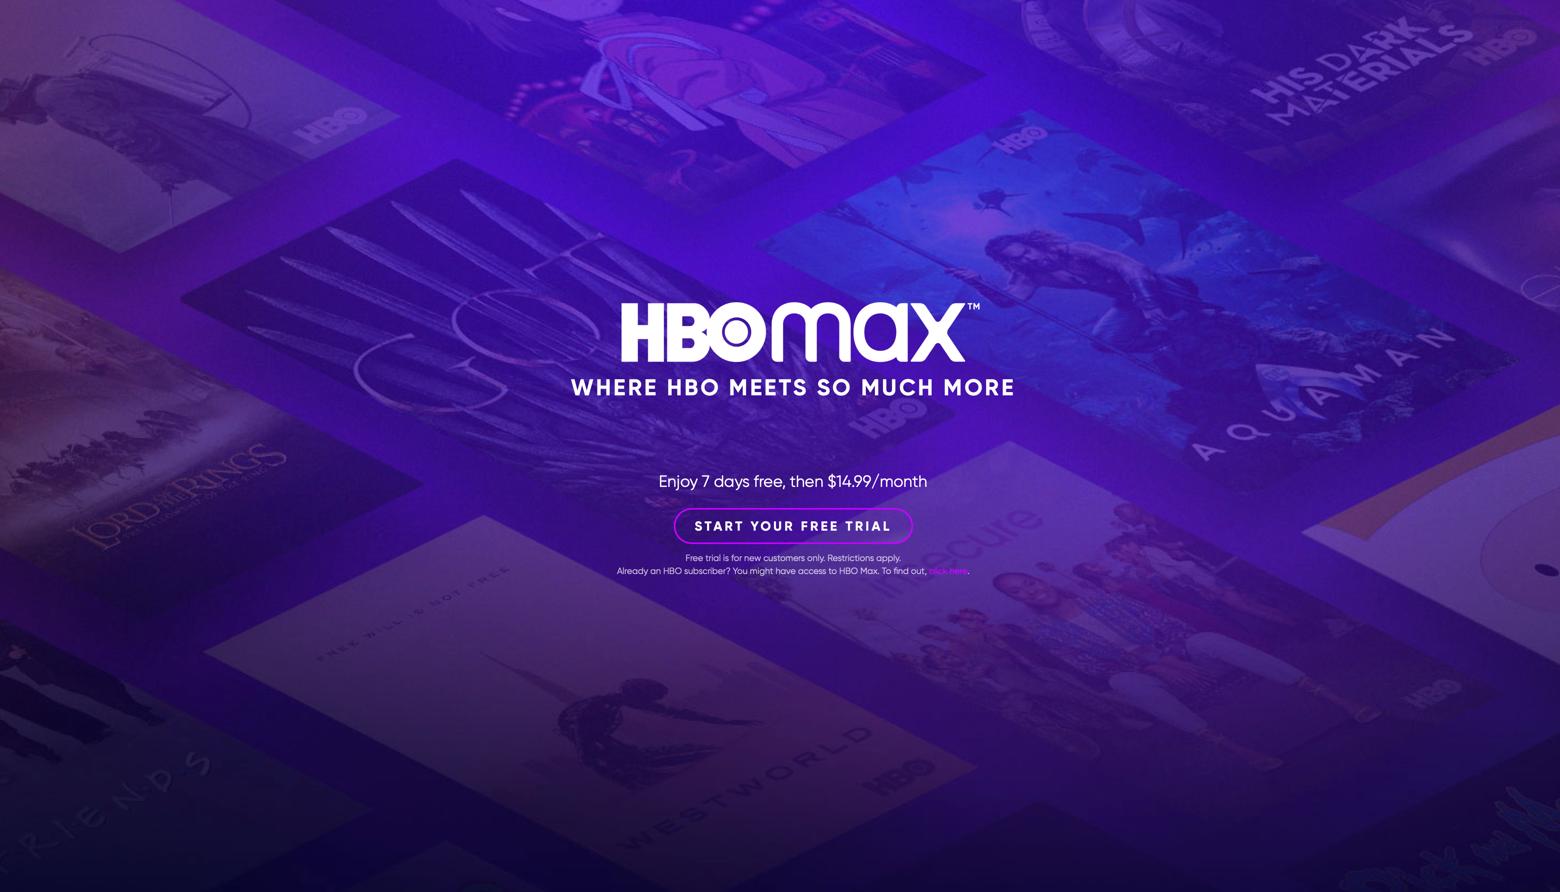 HBO Max website